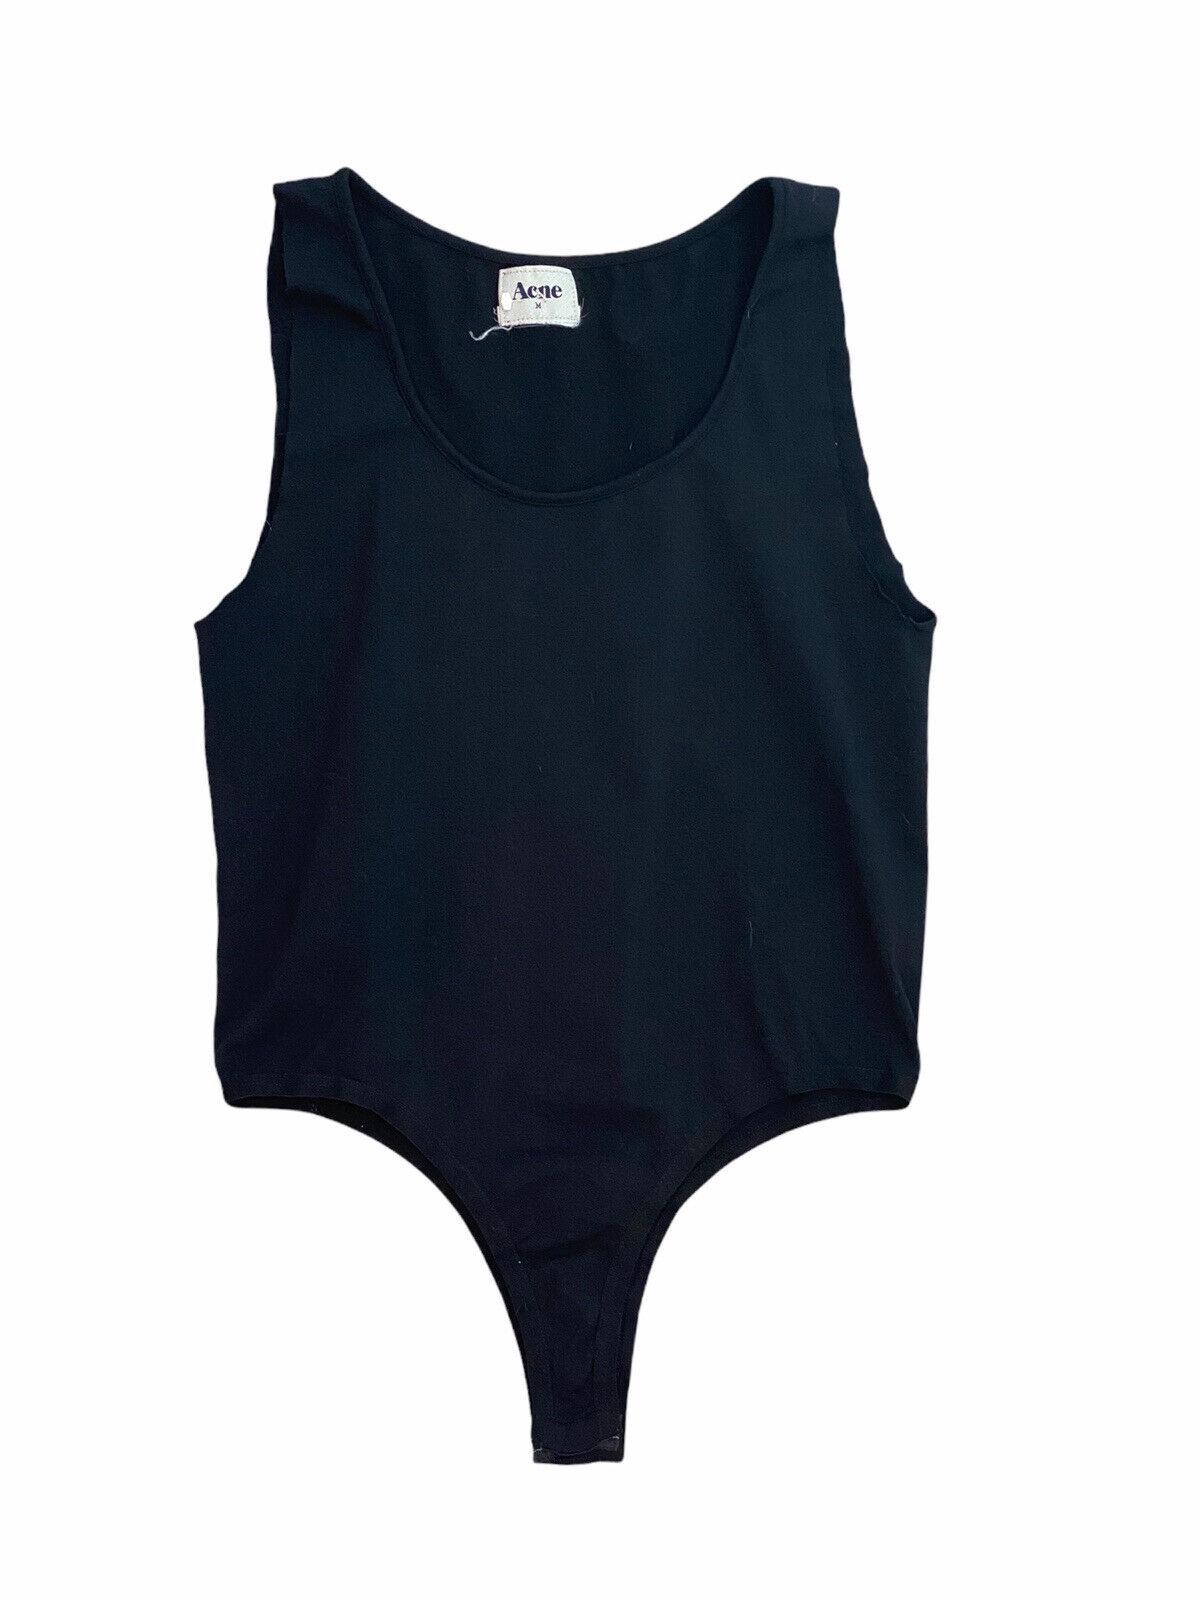 Acne bodysuit - image 1